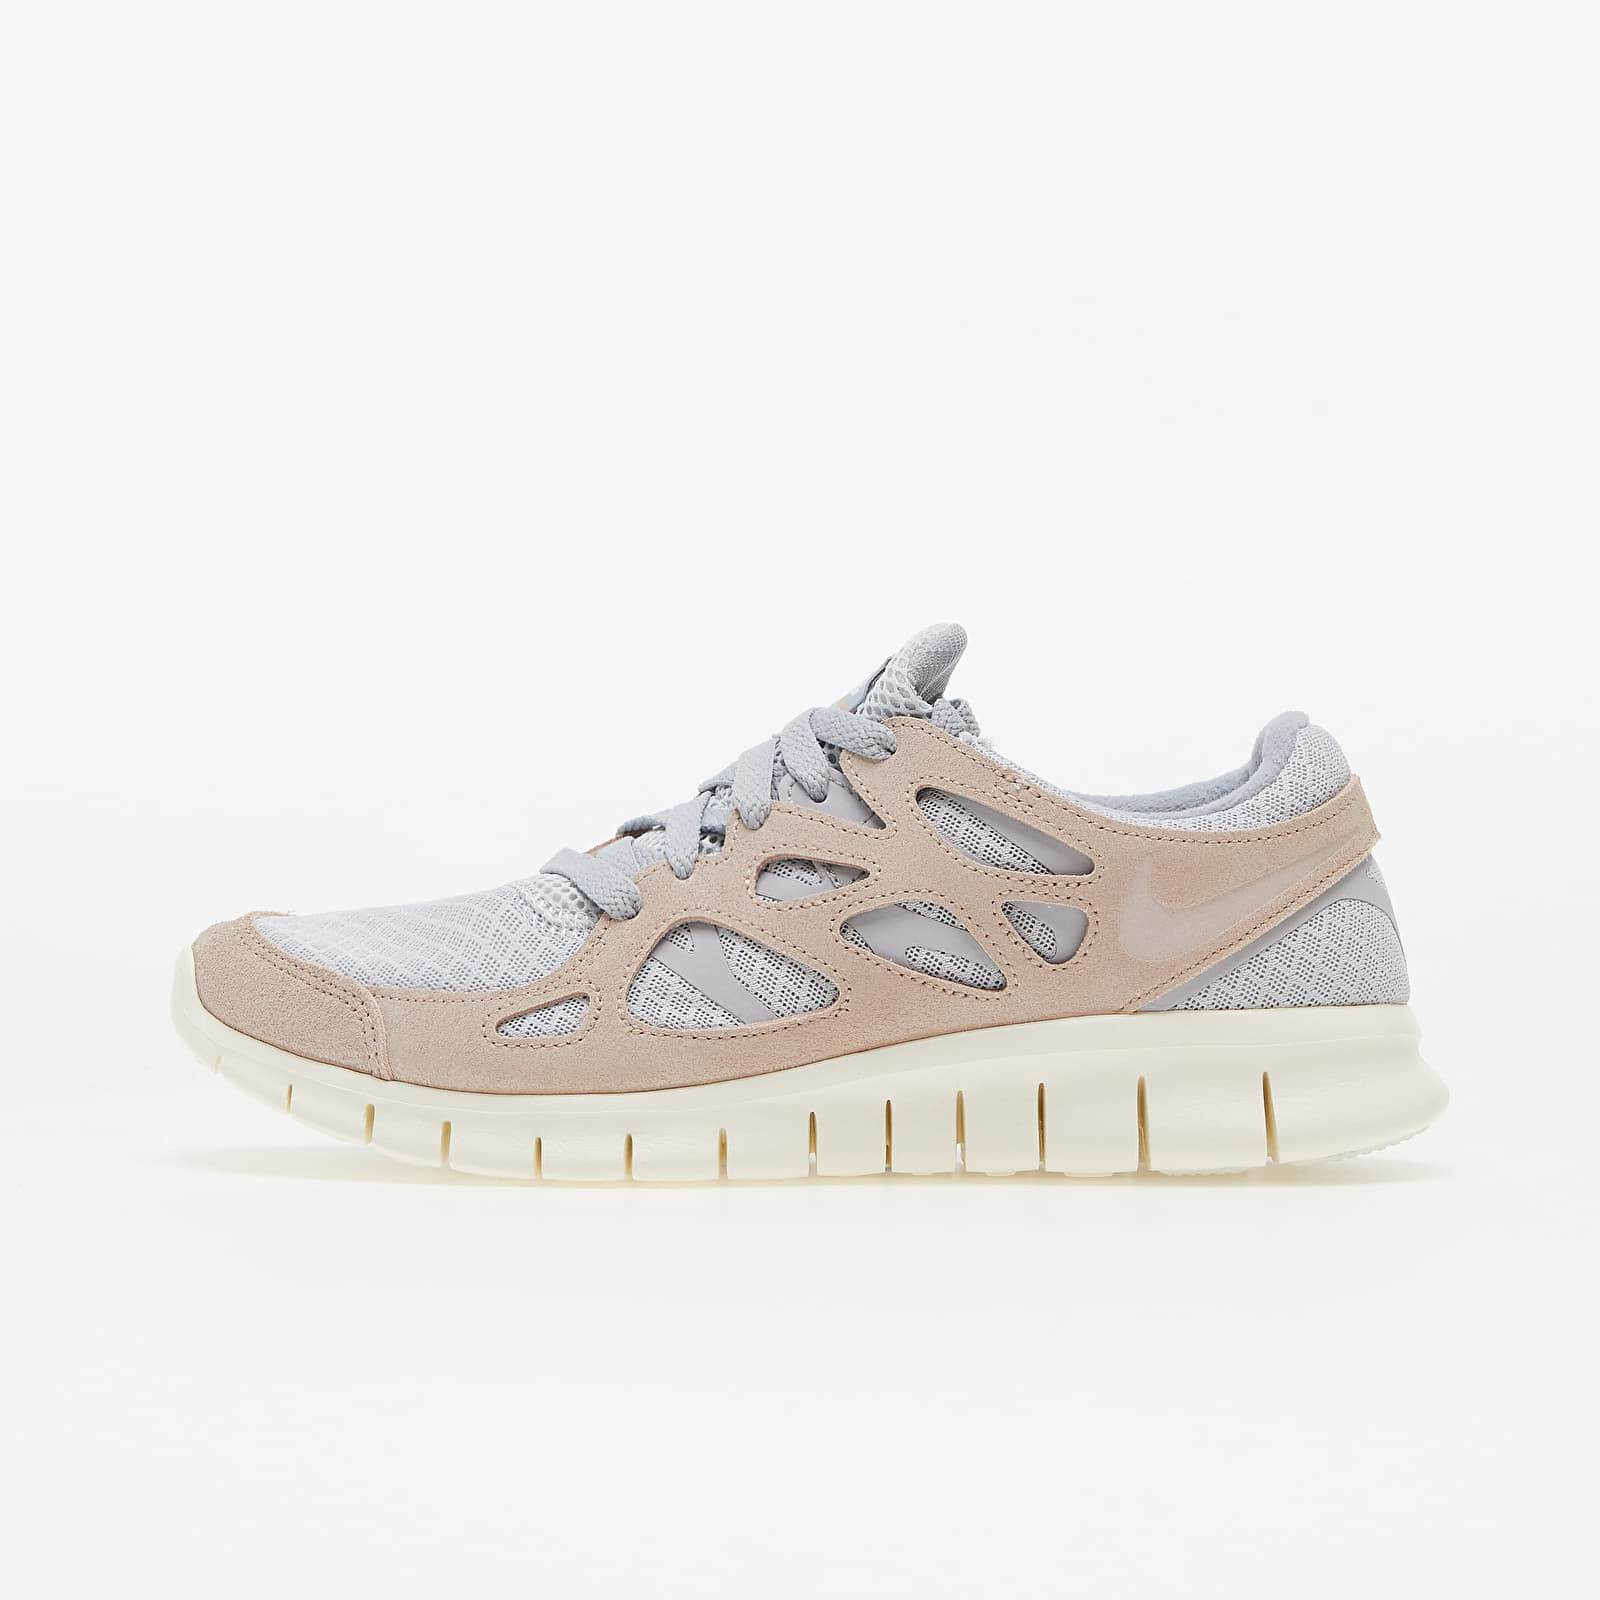 Nike Free Run 2 Pure Platinum/ Fossil Stone-Wolf Grey